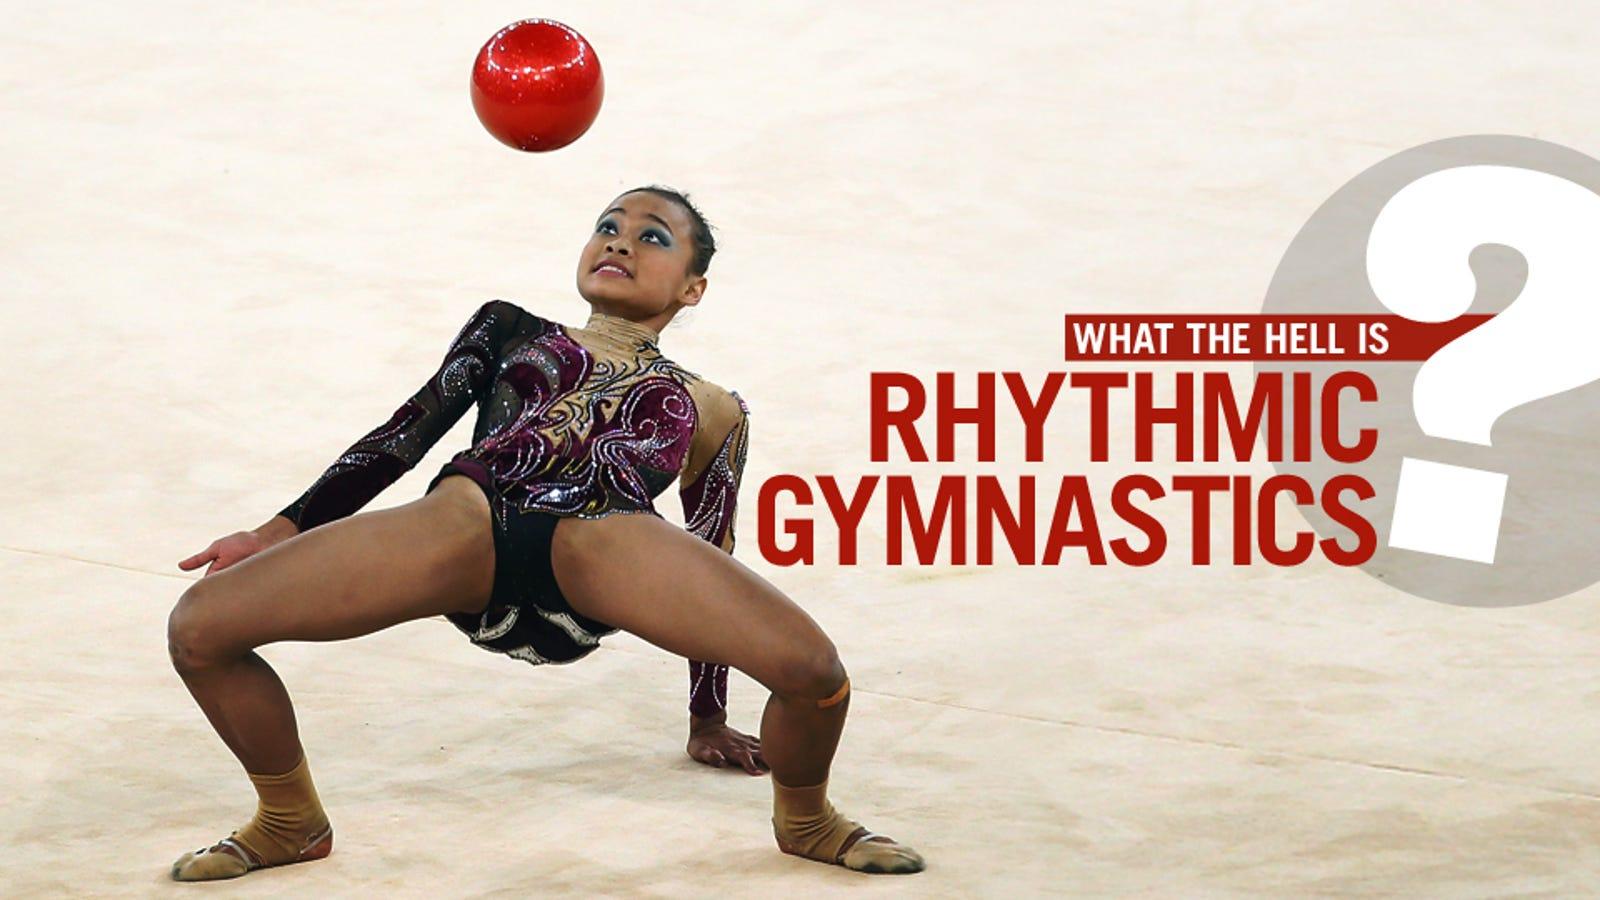 Gymnastics: history and development in Russia 72